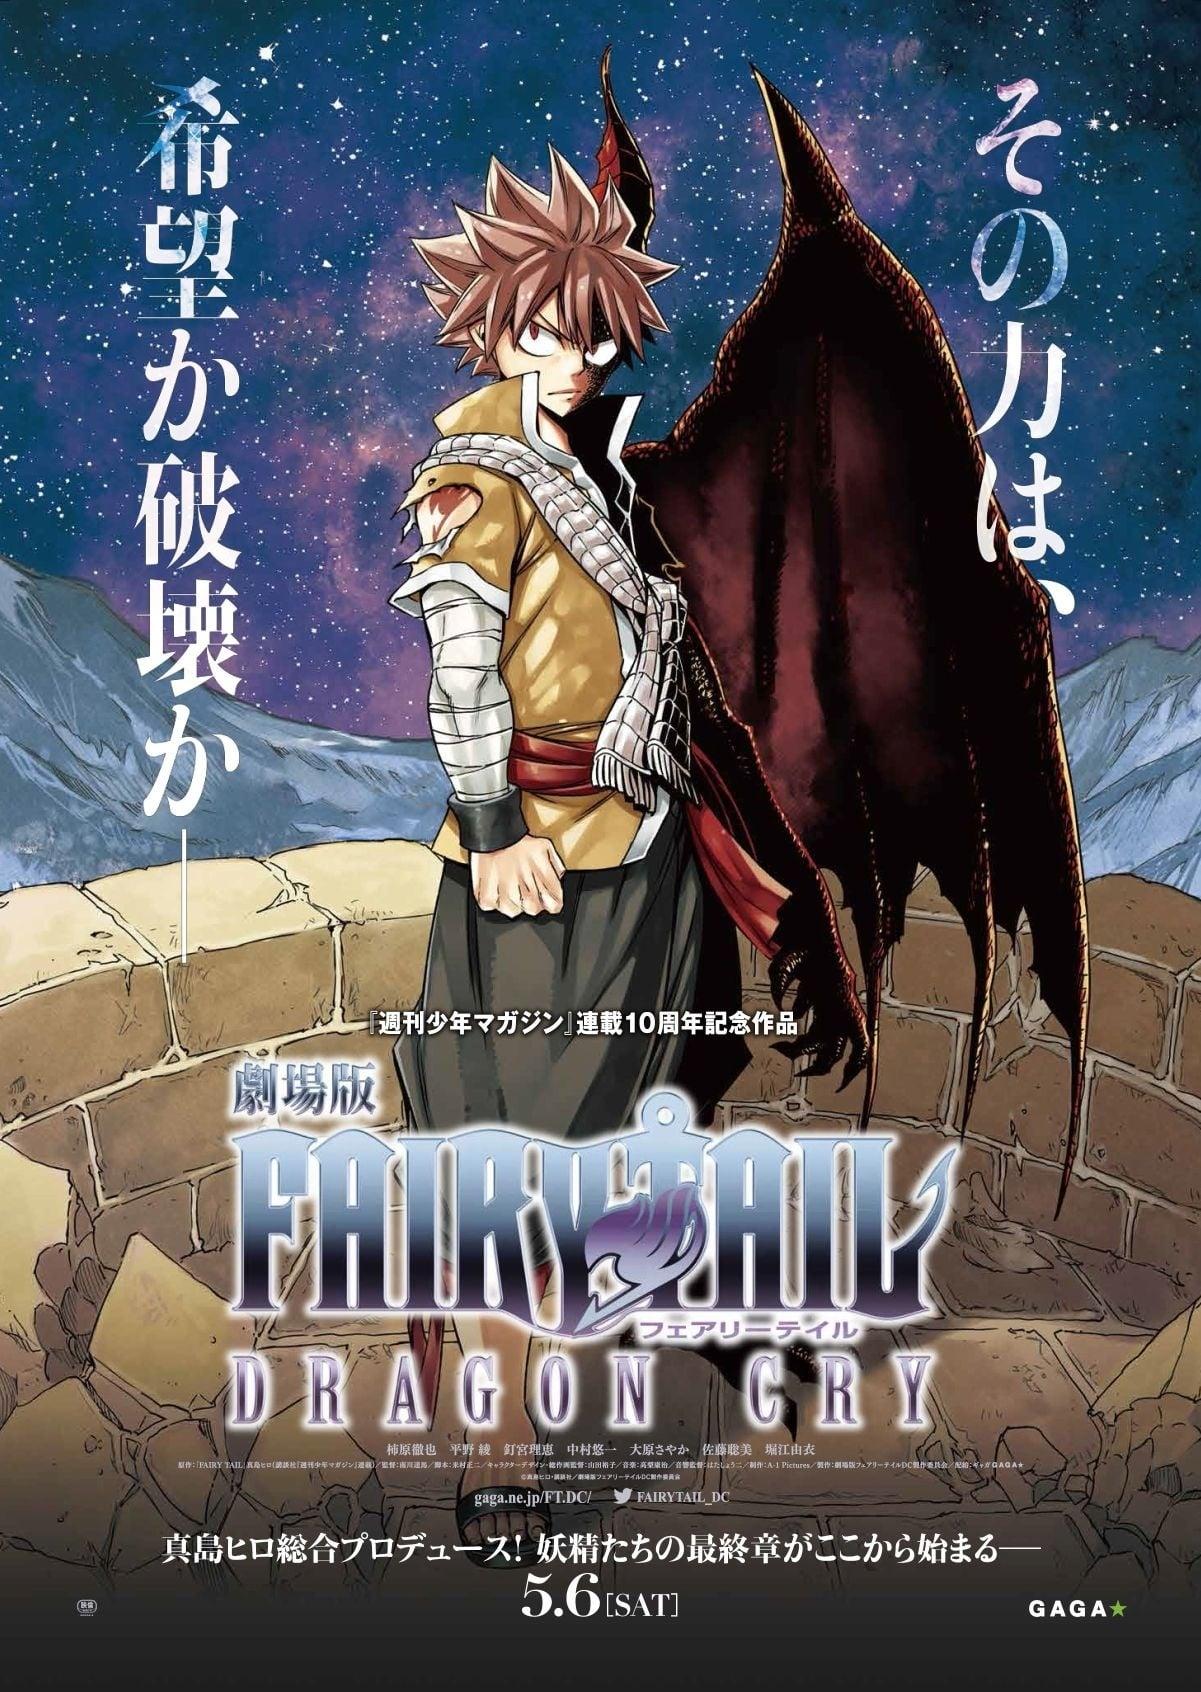 Regarder Fairy Tail Dragon Cry en streaming gratuit